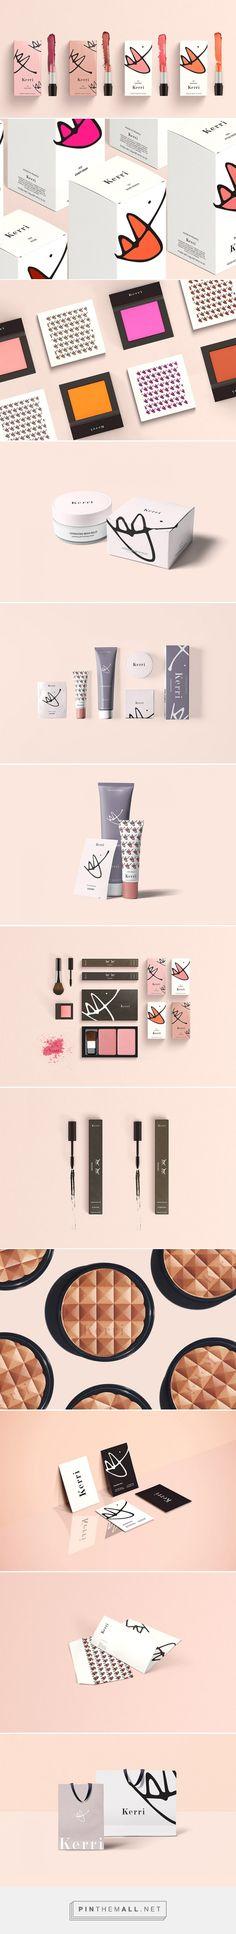 Kerri Cosmetic / Designed by Danielle Han Cool Packaging, Bottle Packaging, Cosmetic Packaging, Beauty Packaging, Brand Packaging, Packaging Ideas, Design Packaging, Product Packaging, Graphic Design Branding